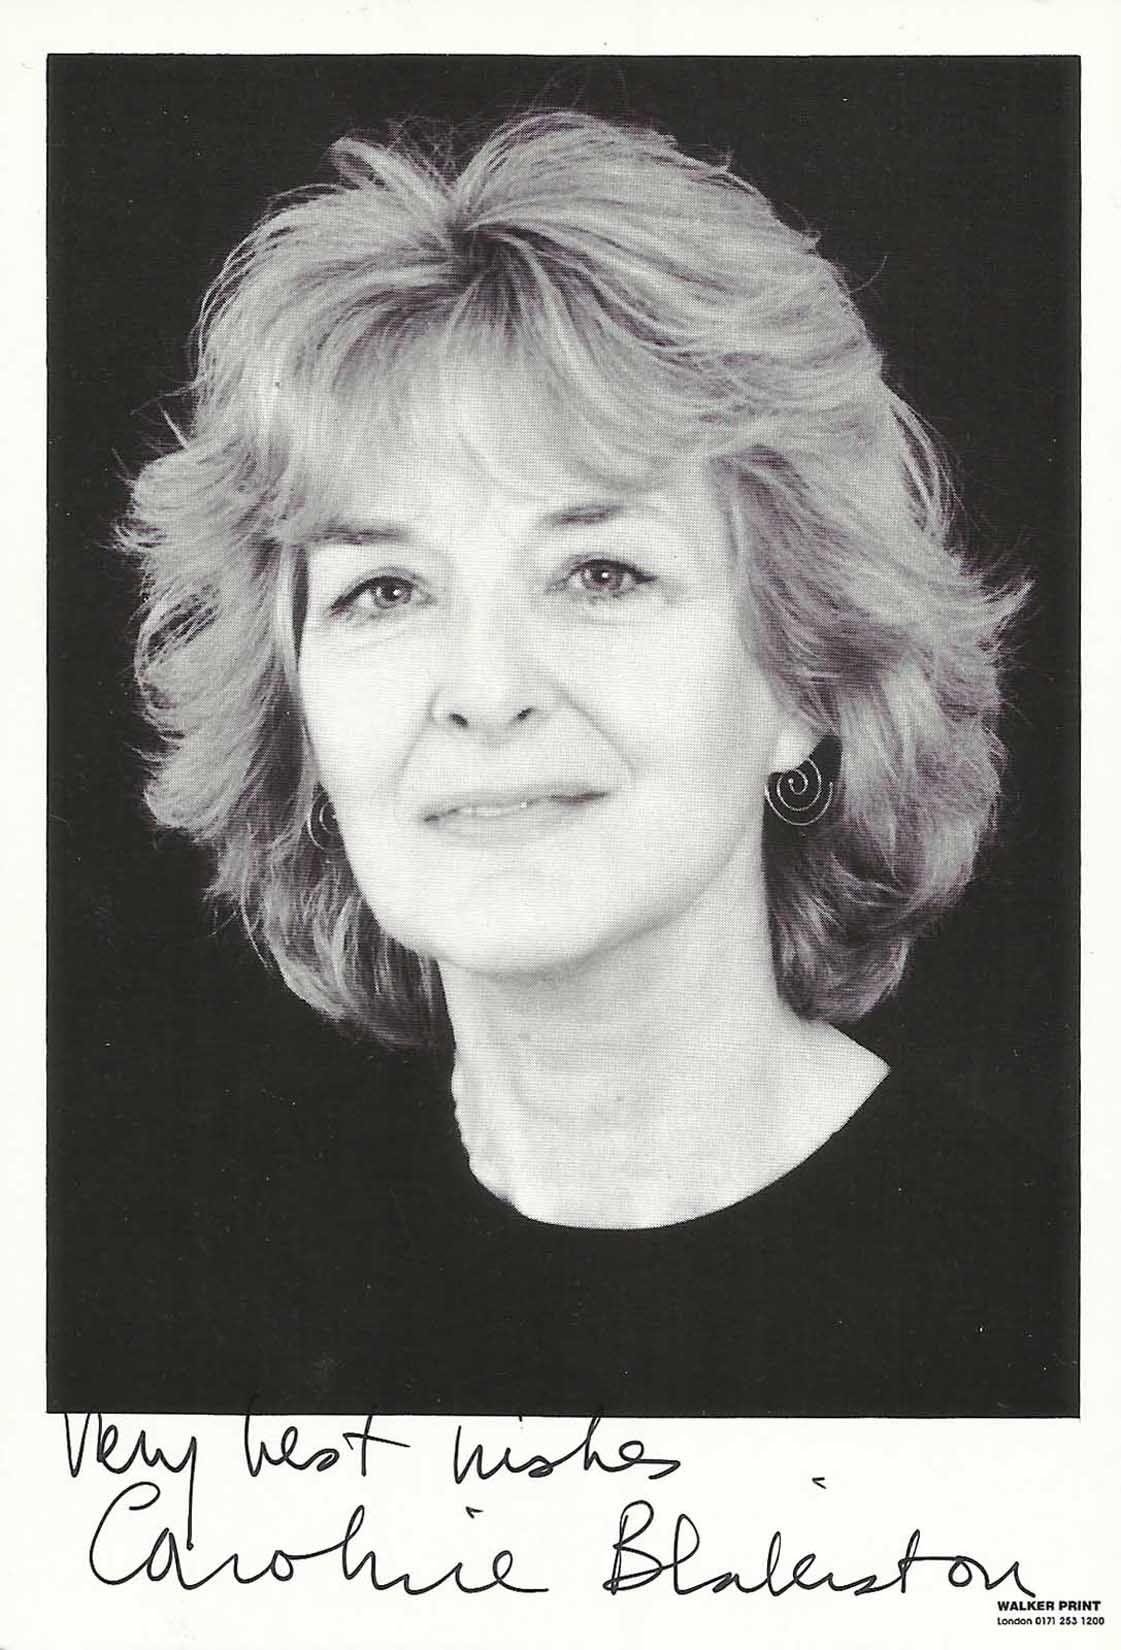 Gabriella Pizzolo Adult tube Stephanie Sheh,Susan Howard born January 28, 1944 (age 74)